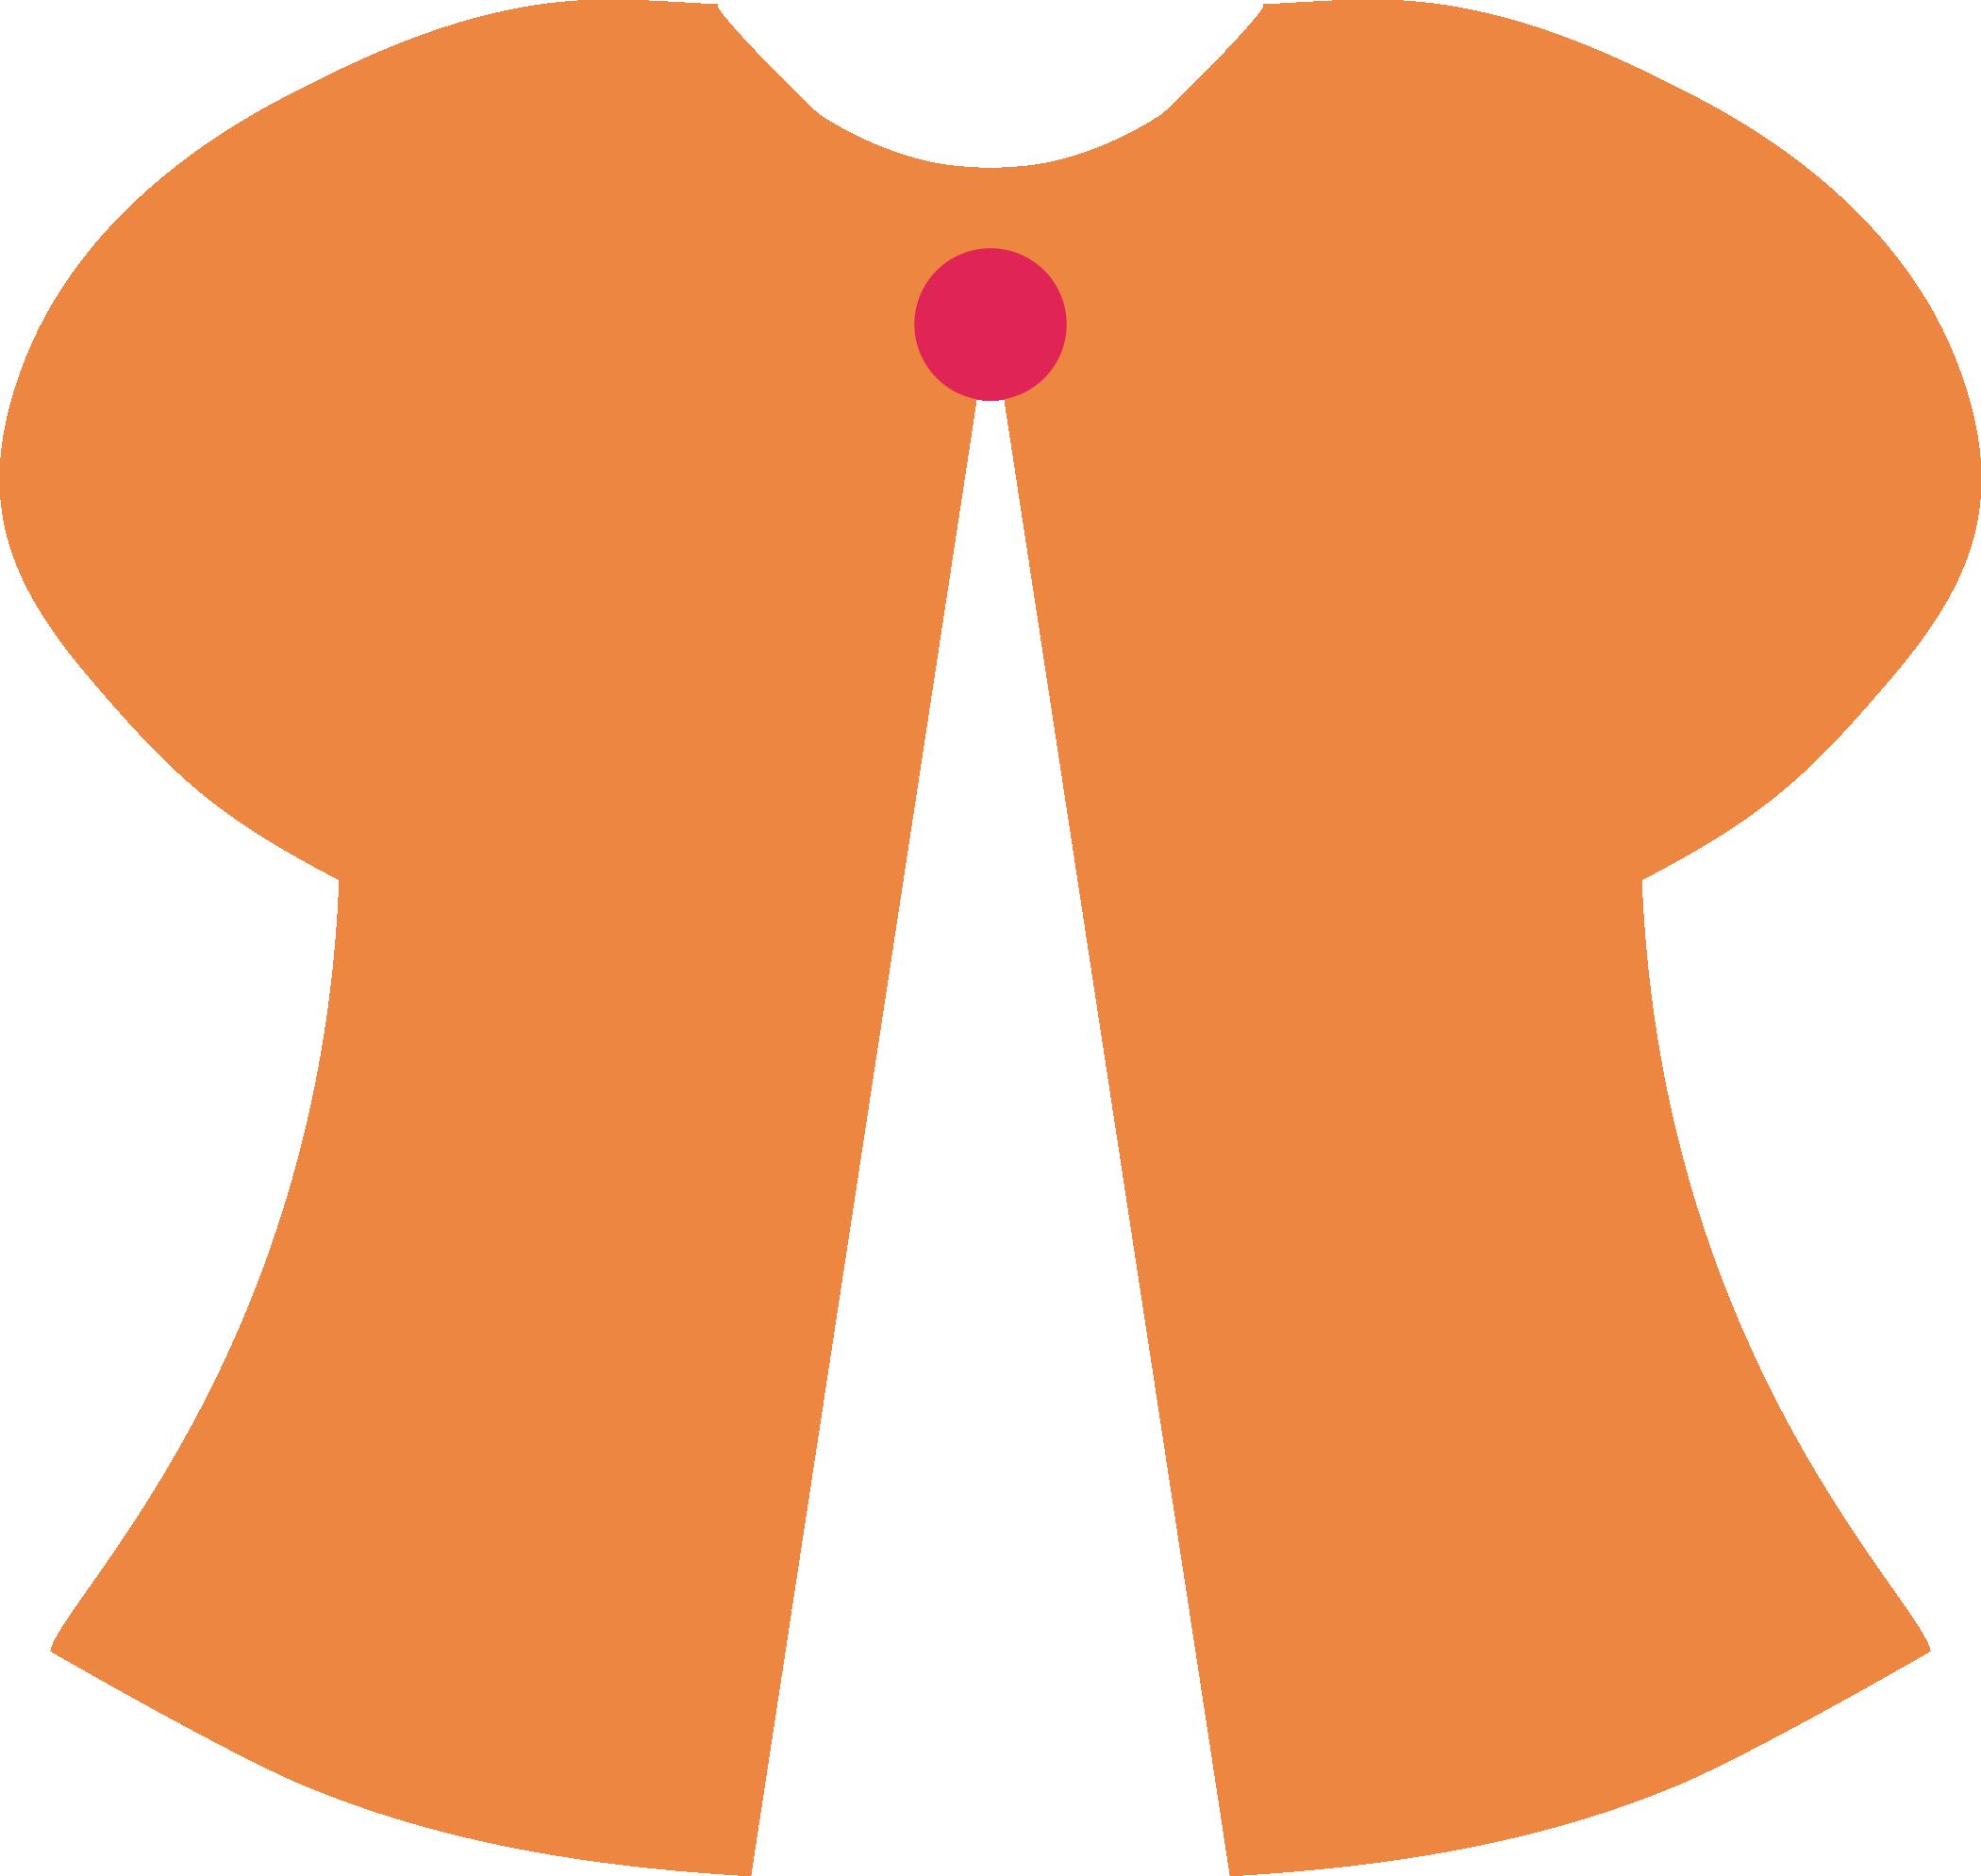 Planner clipart orange folder. Costura e roupas jwi